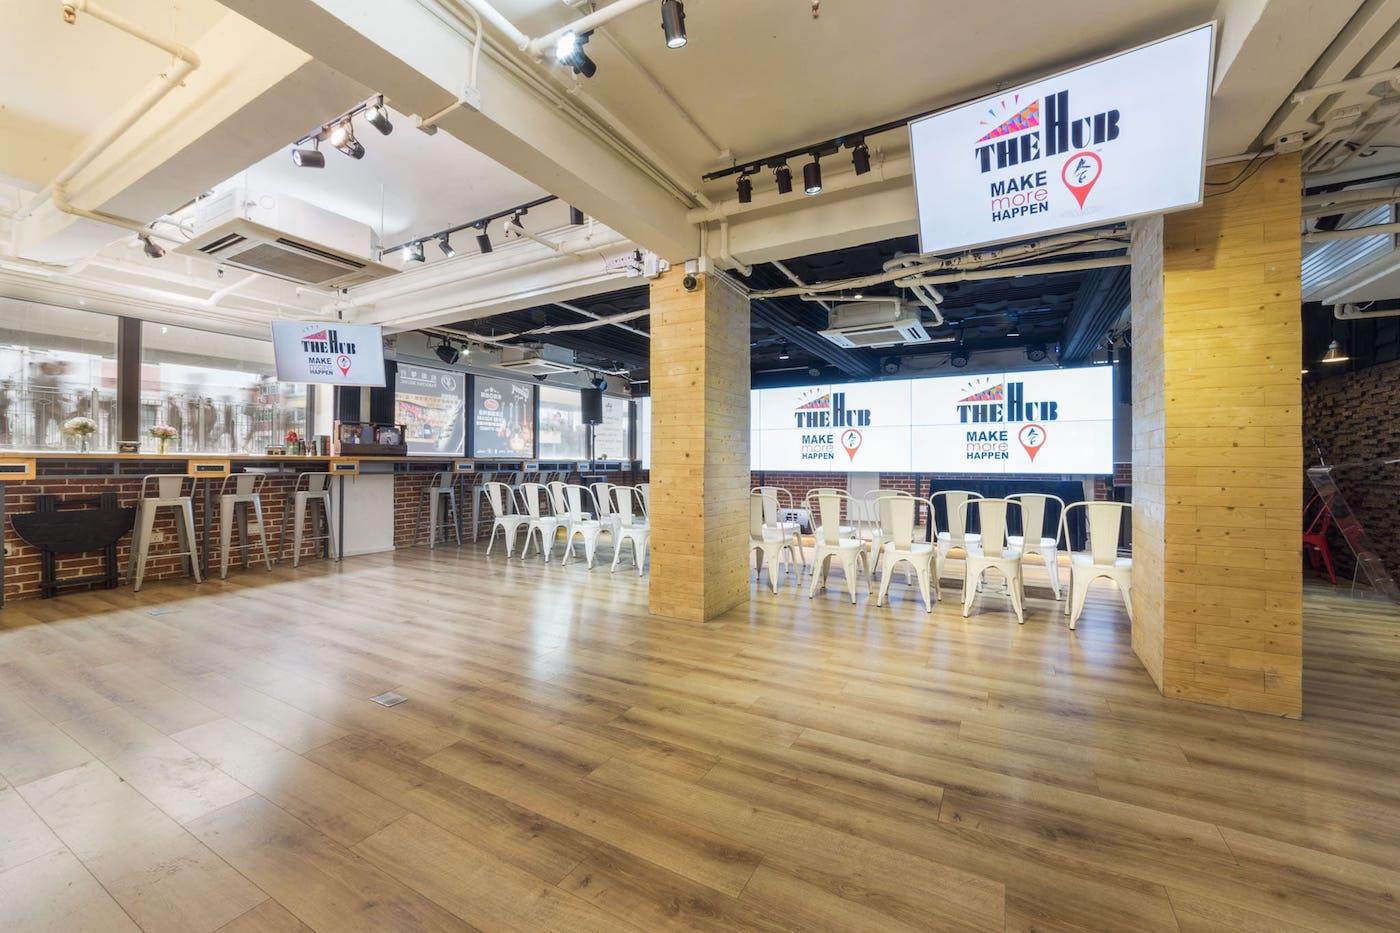 The Hub space Wan chai | MICE venues in Hong Kong